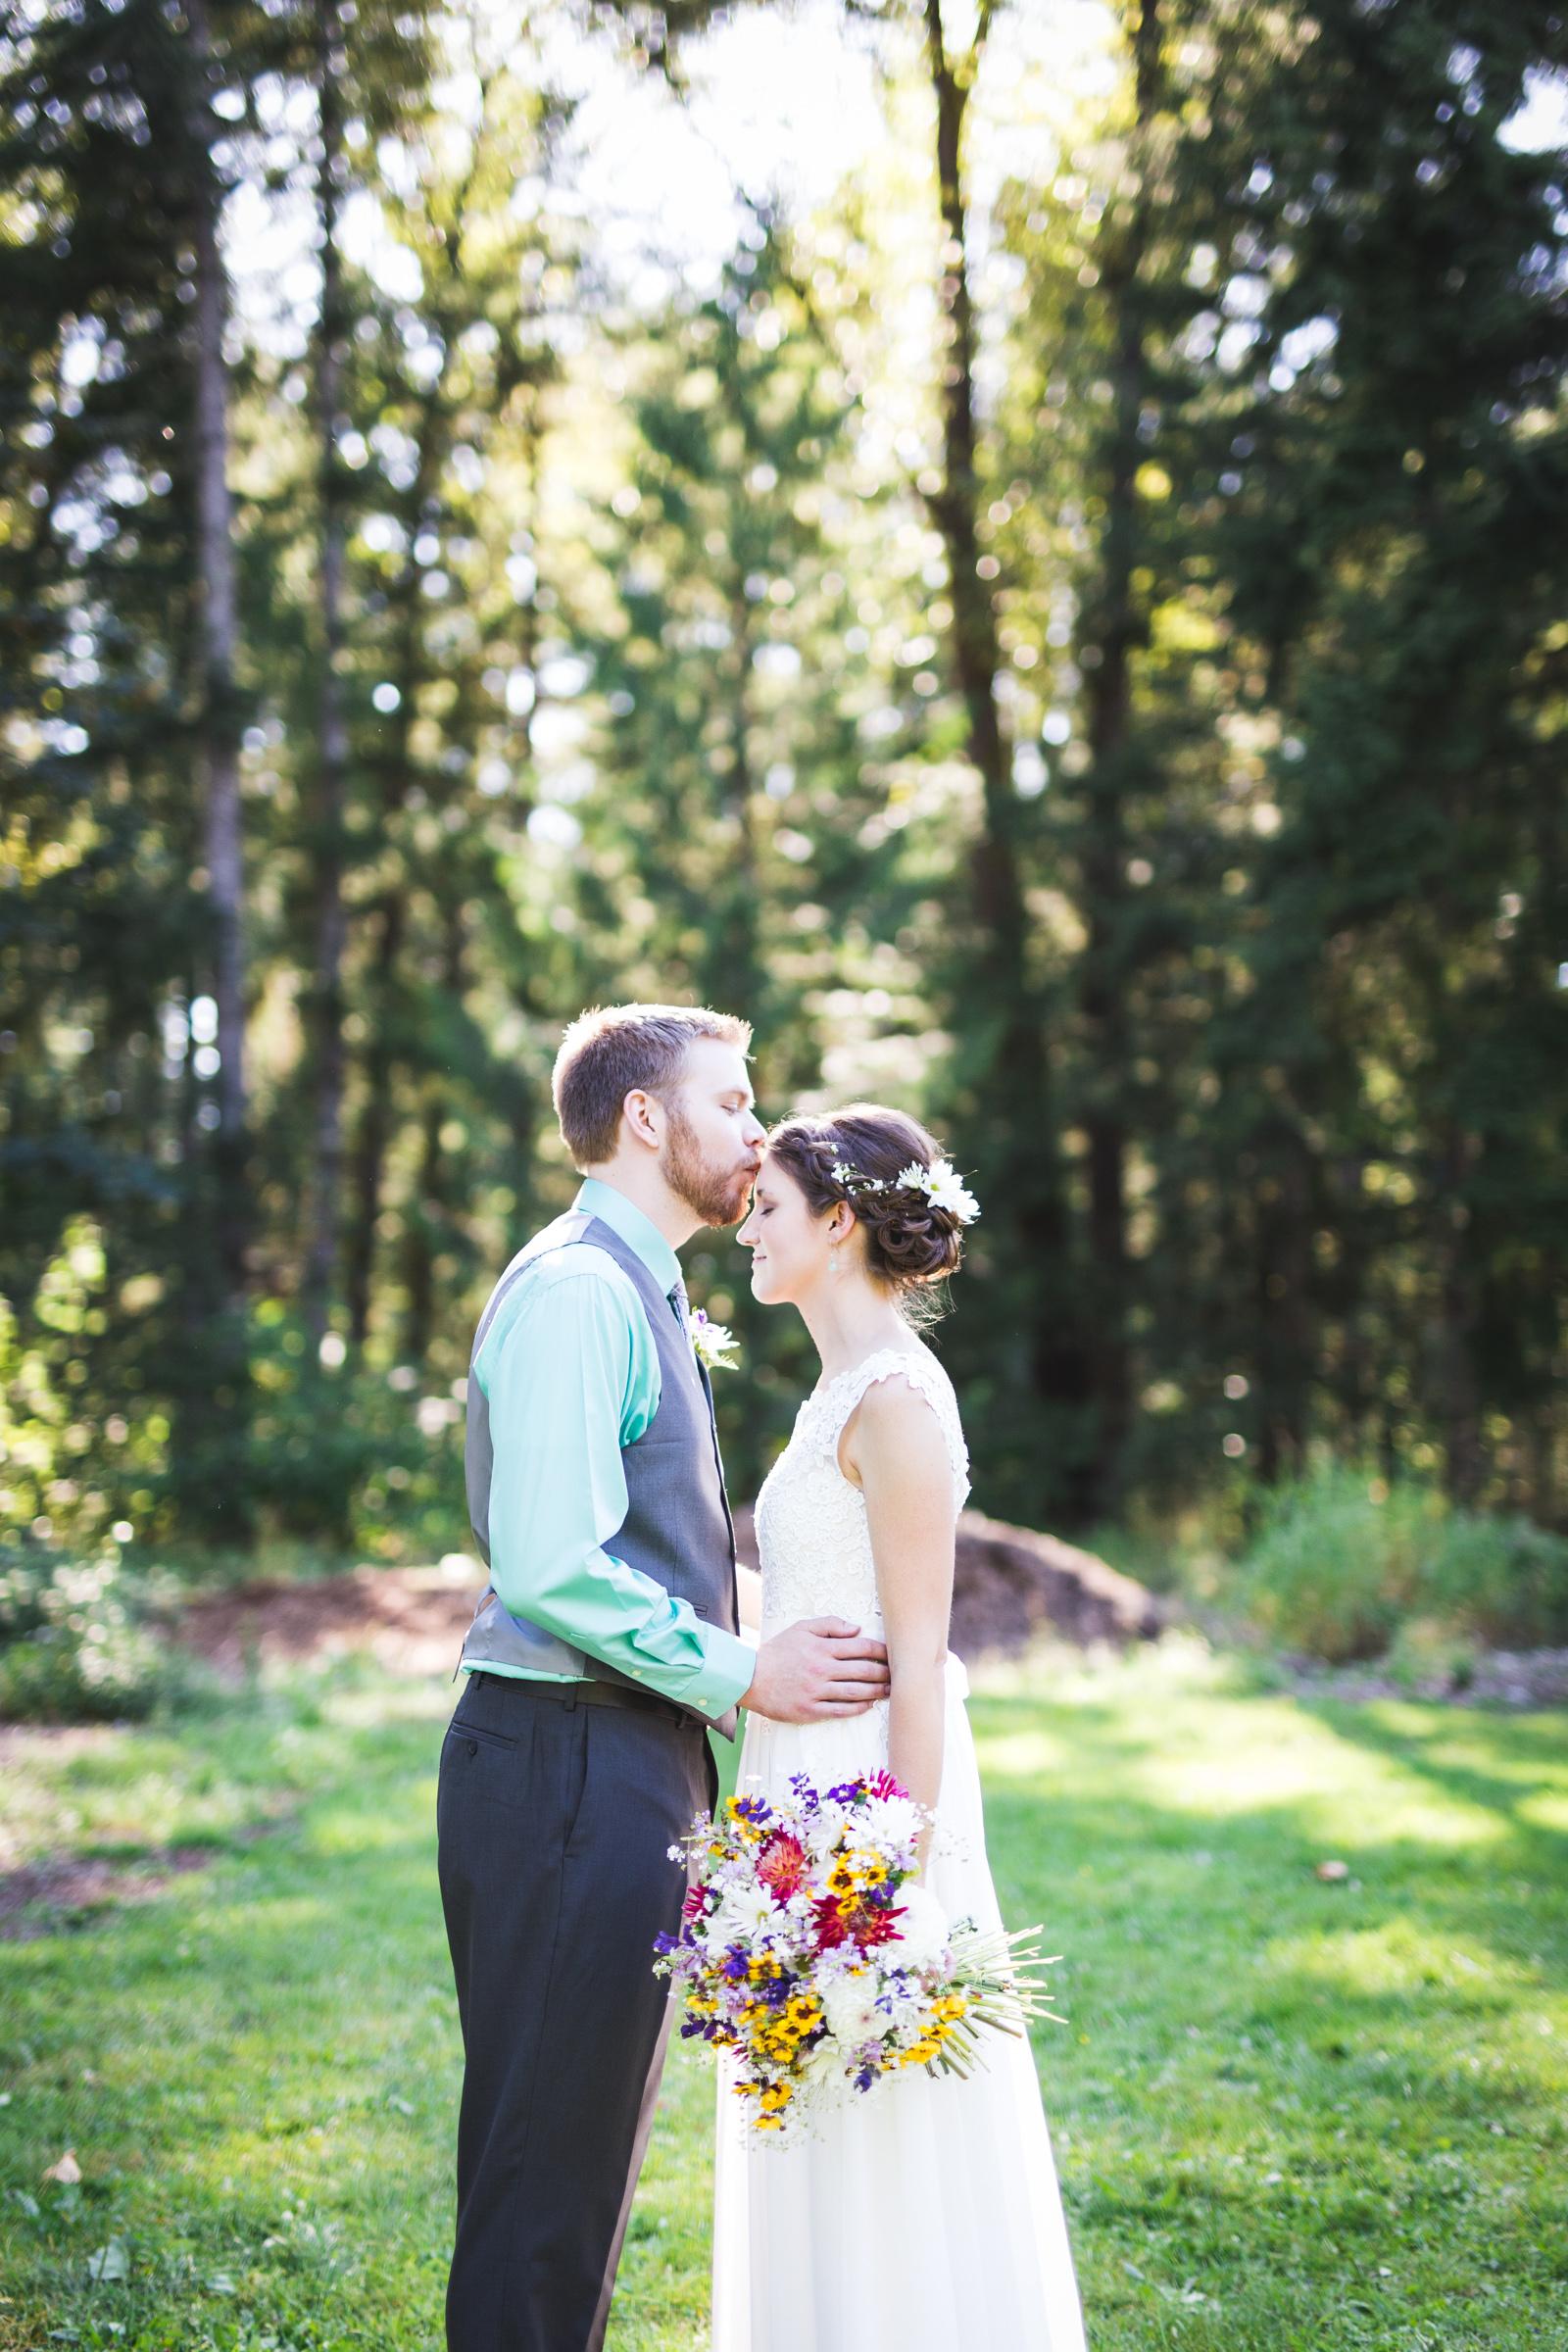 LukeSarah-Seattle-Wedding-080516-0127.jpg